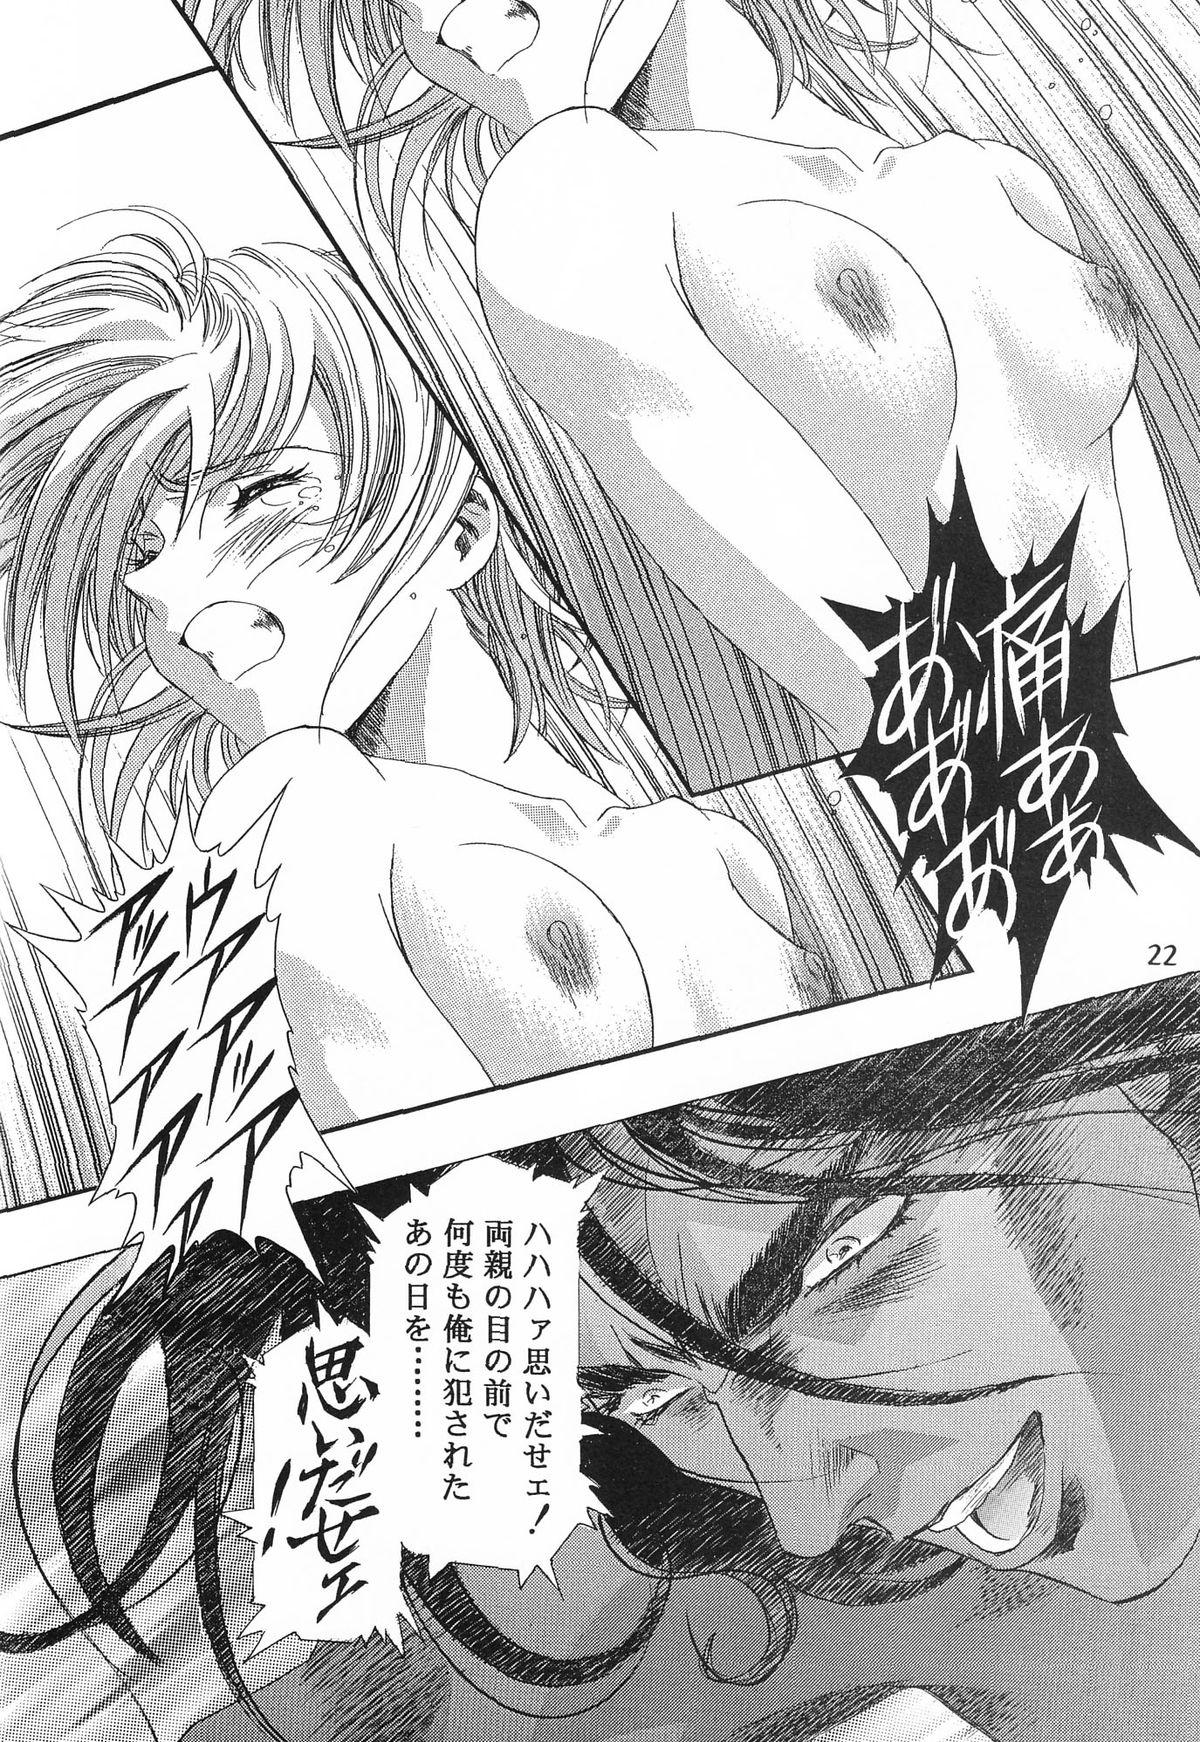 Henrei-kai '98 Natsu SPECIAL 23